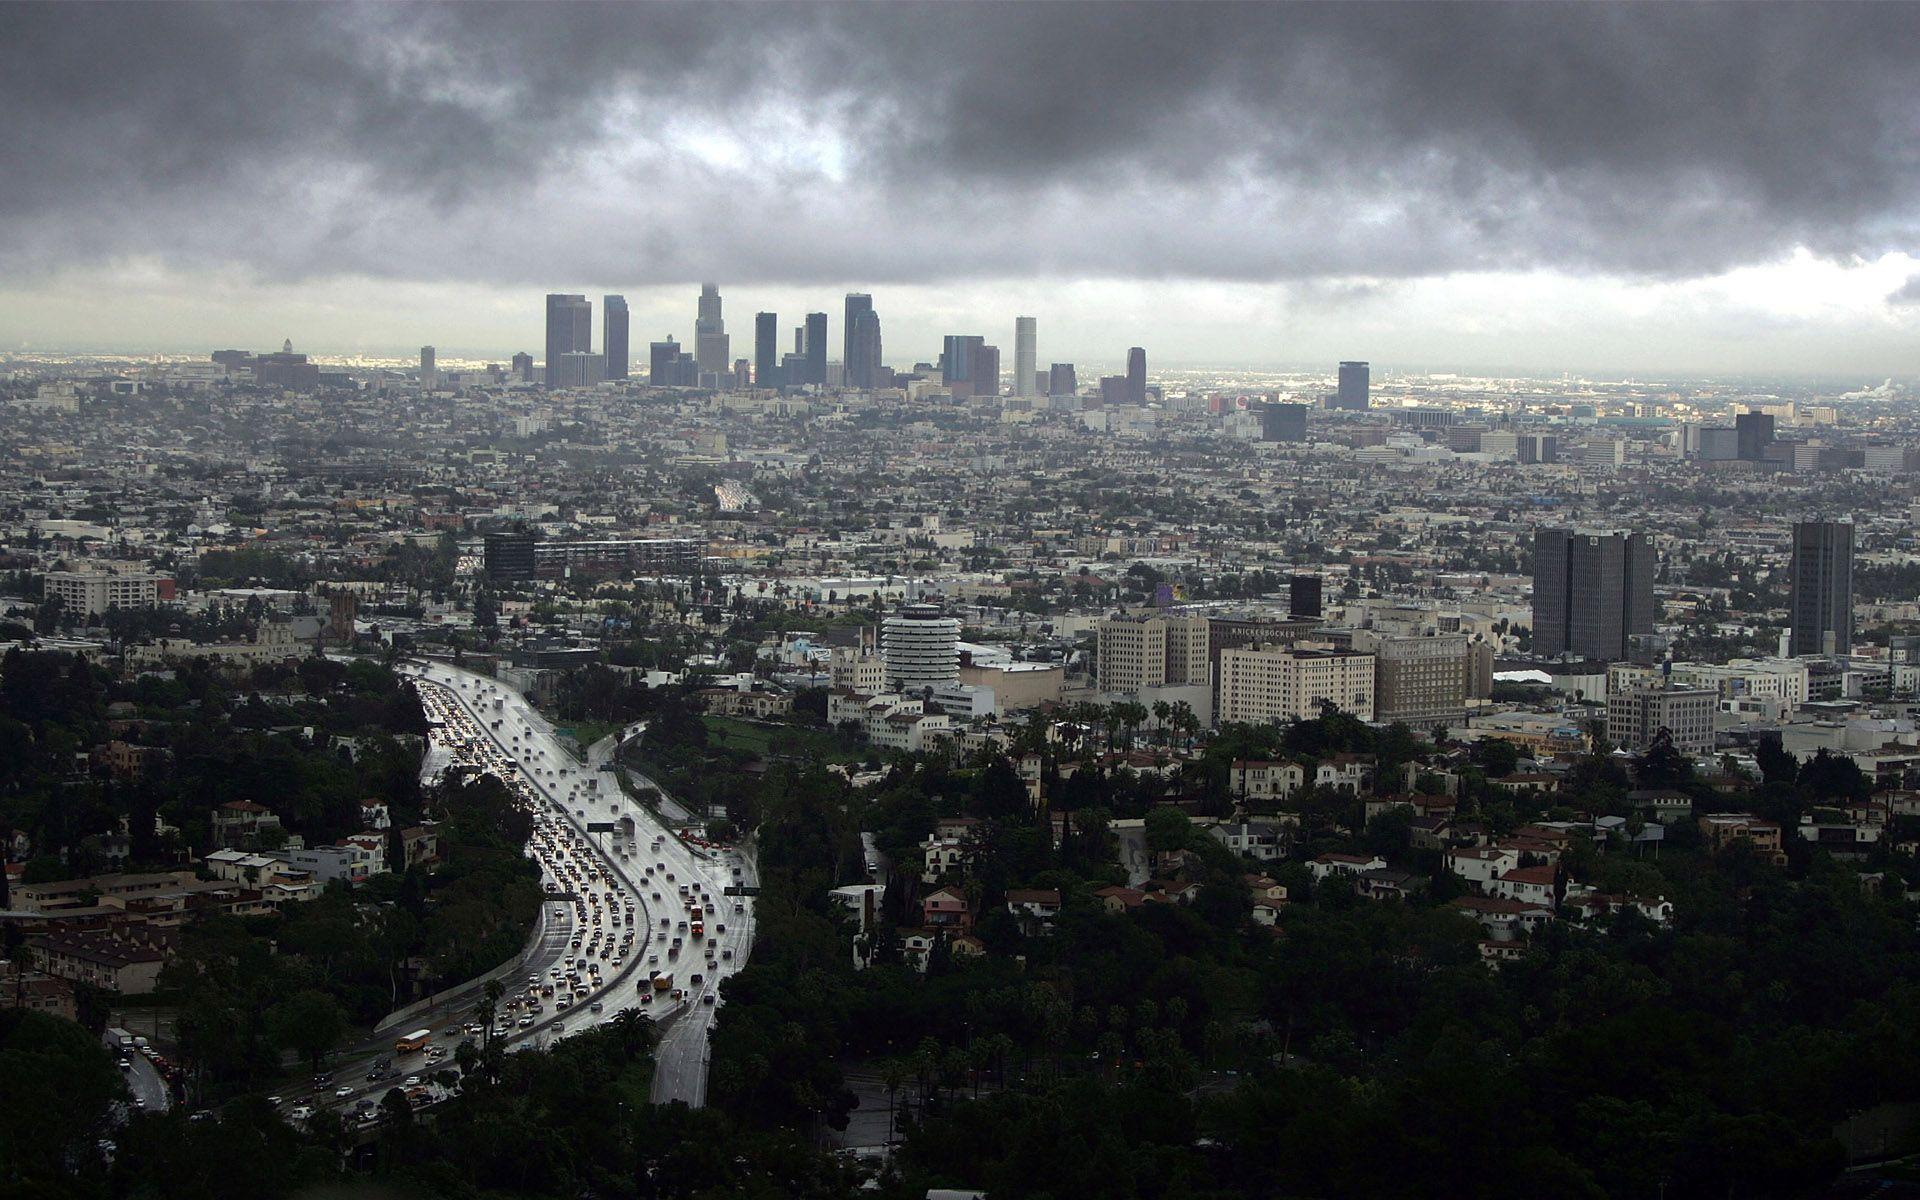 Los Angeles Wallpaper #6880092